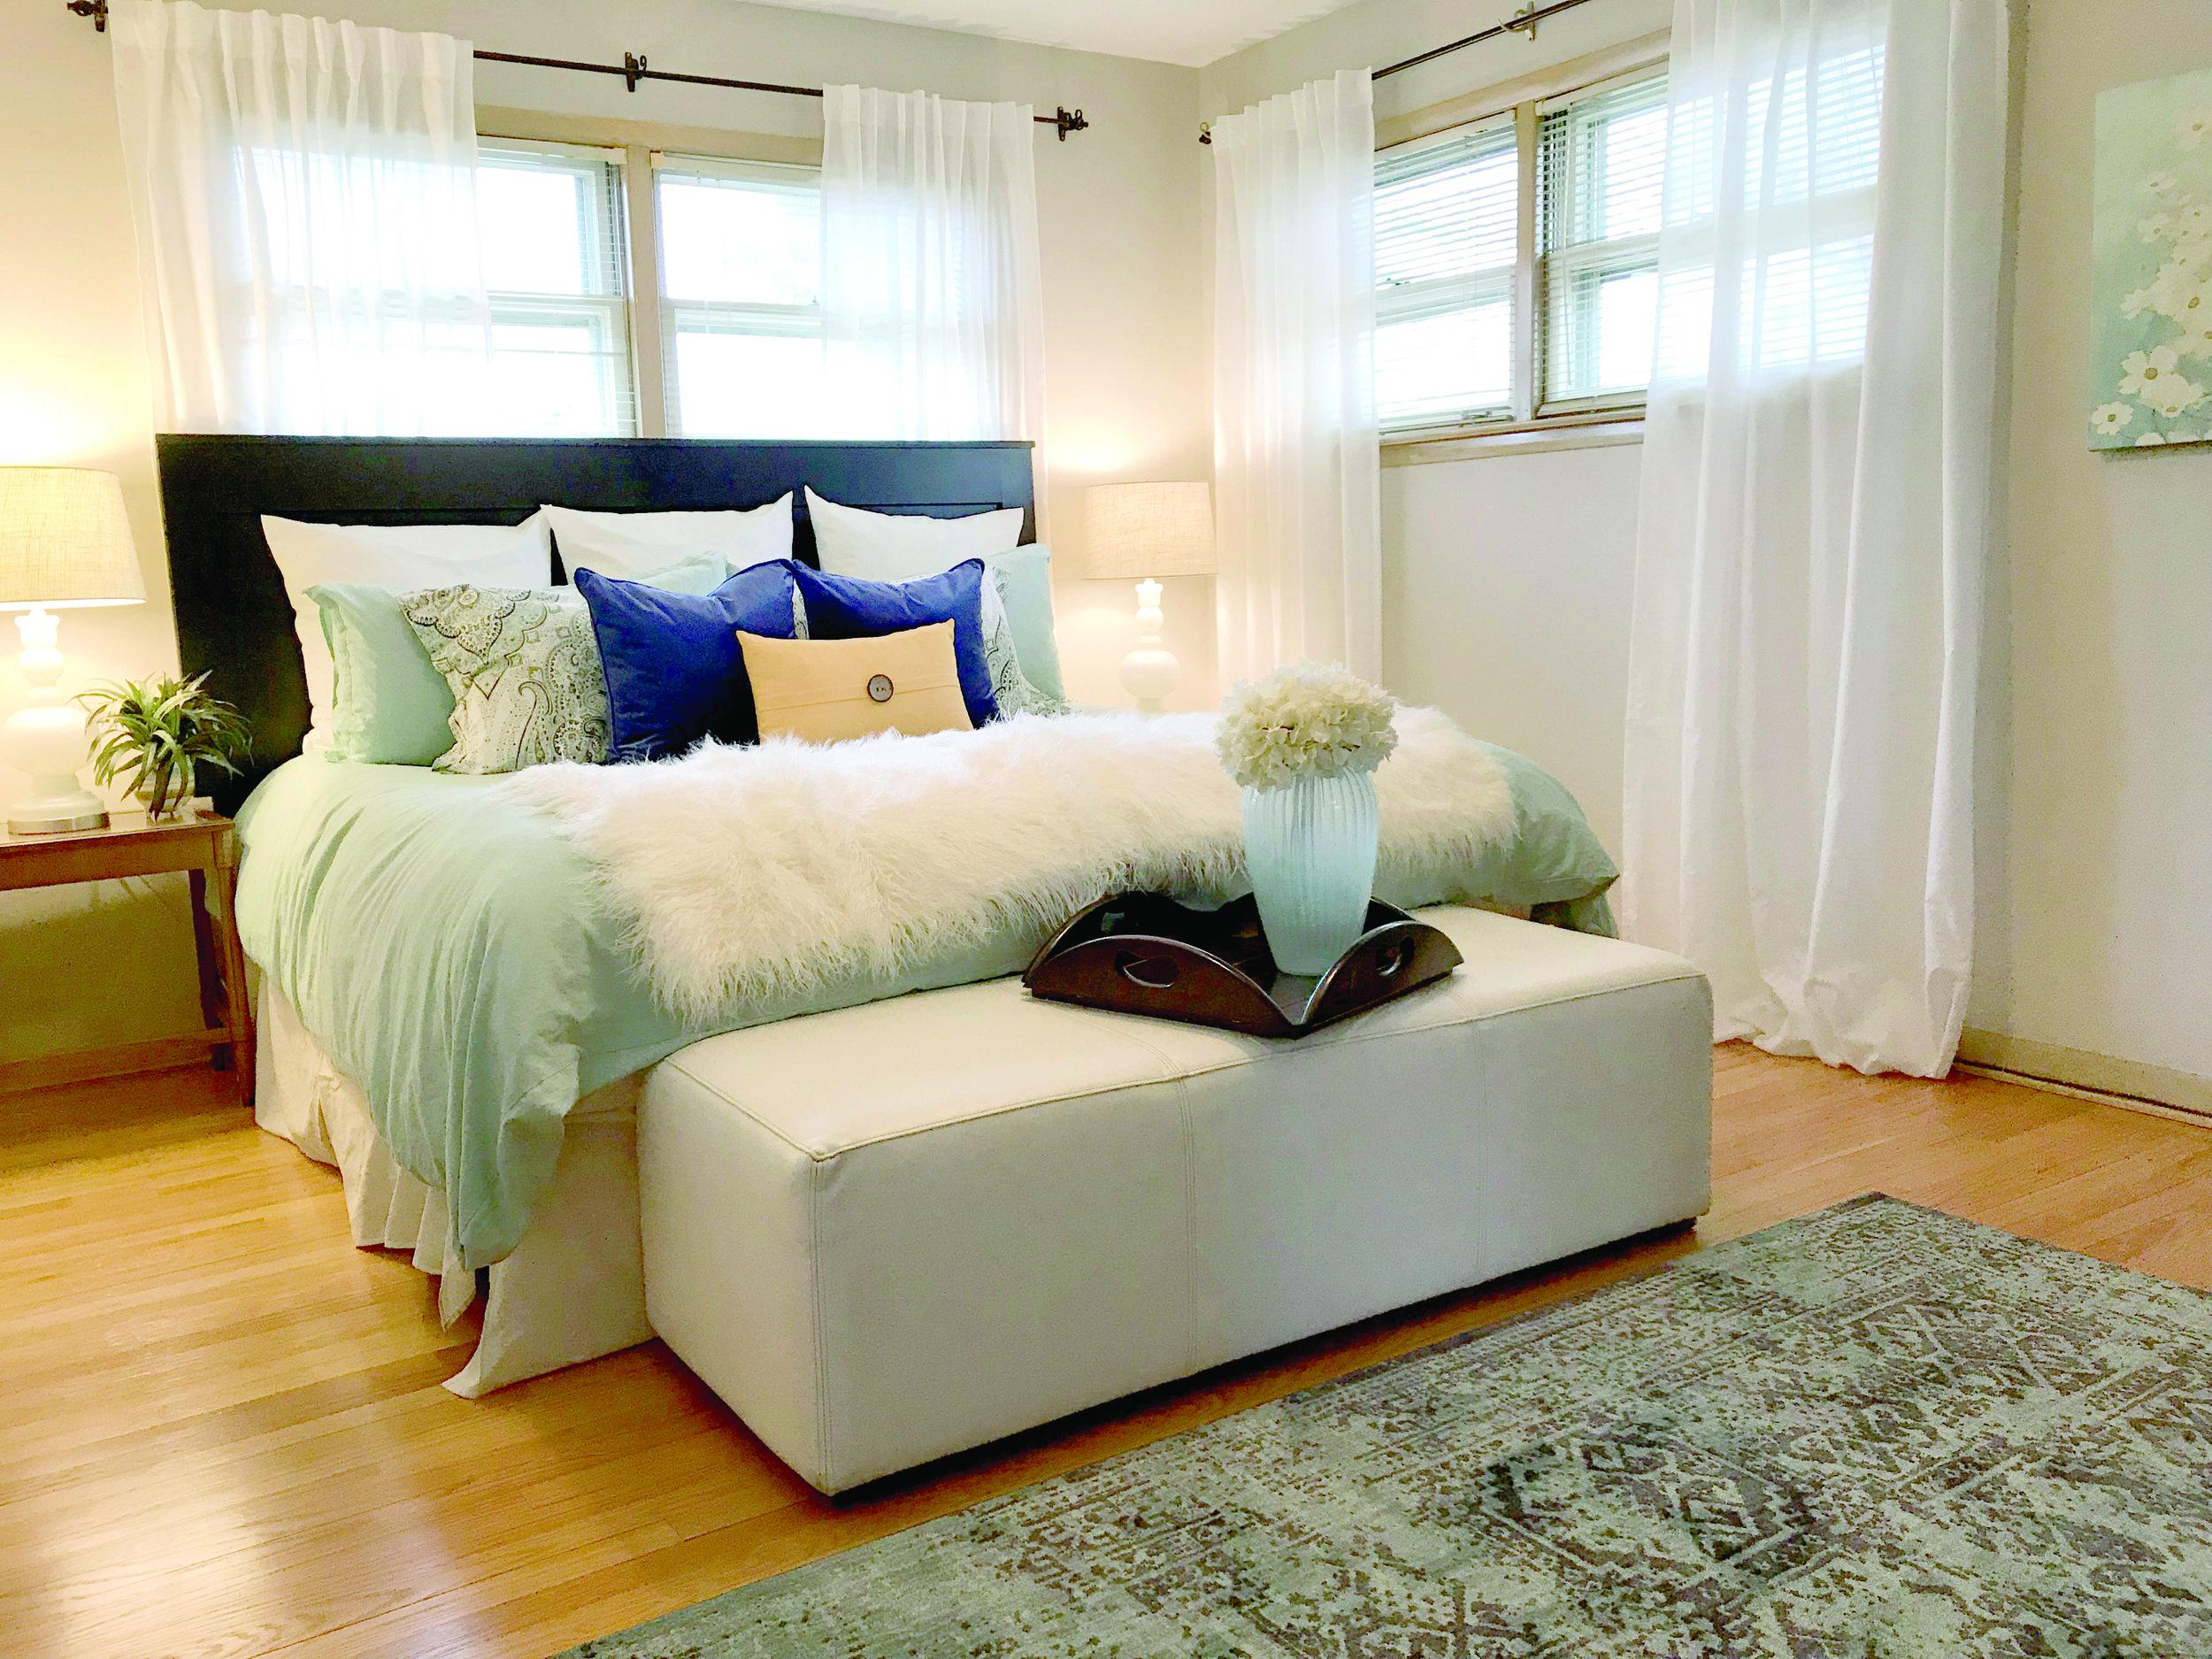 5540WOakton_Bedroom_after3.jpg